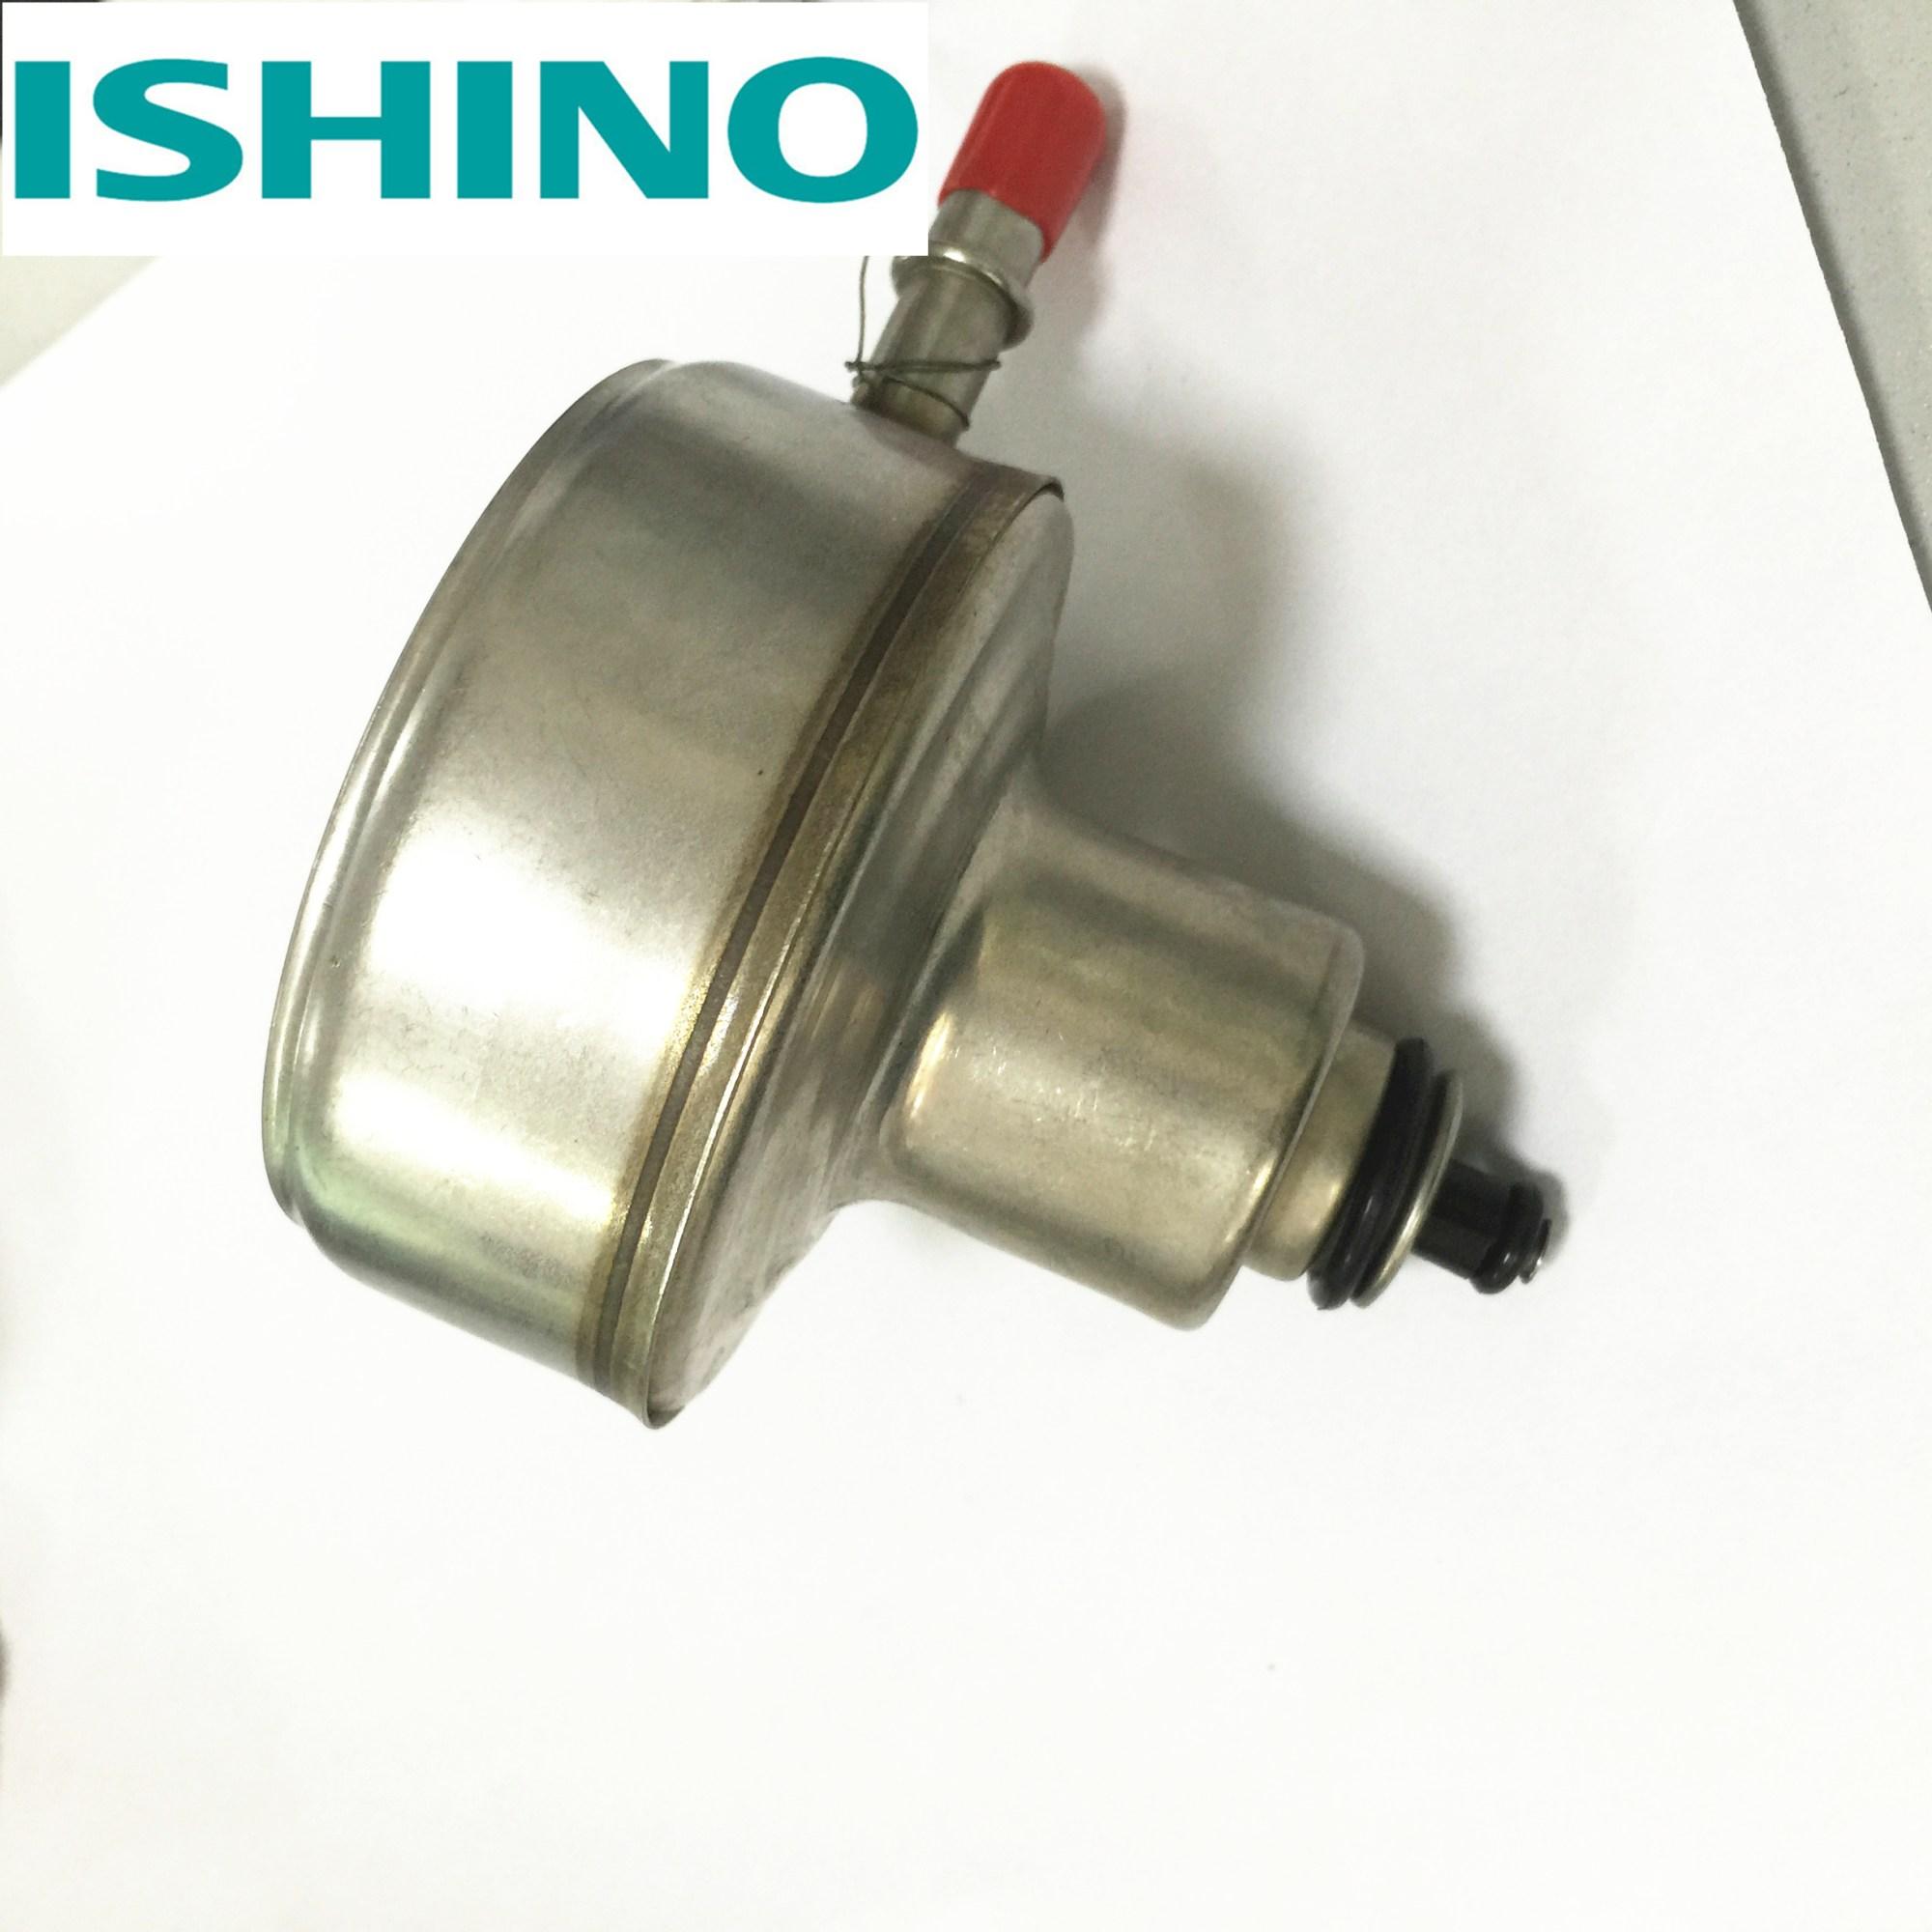 hight resolution of new premium performance fuel filter pressure regulator fpr fuel pump pr318 4798301 52100053